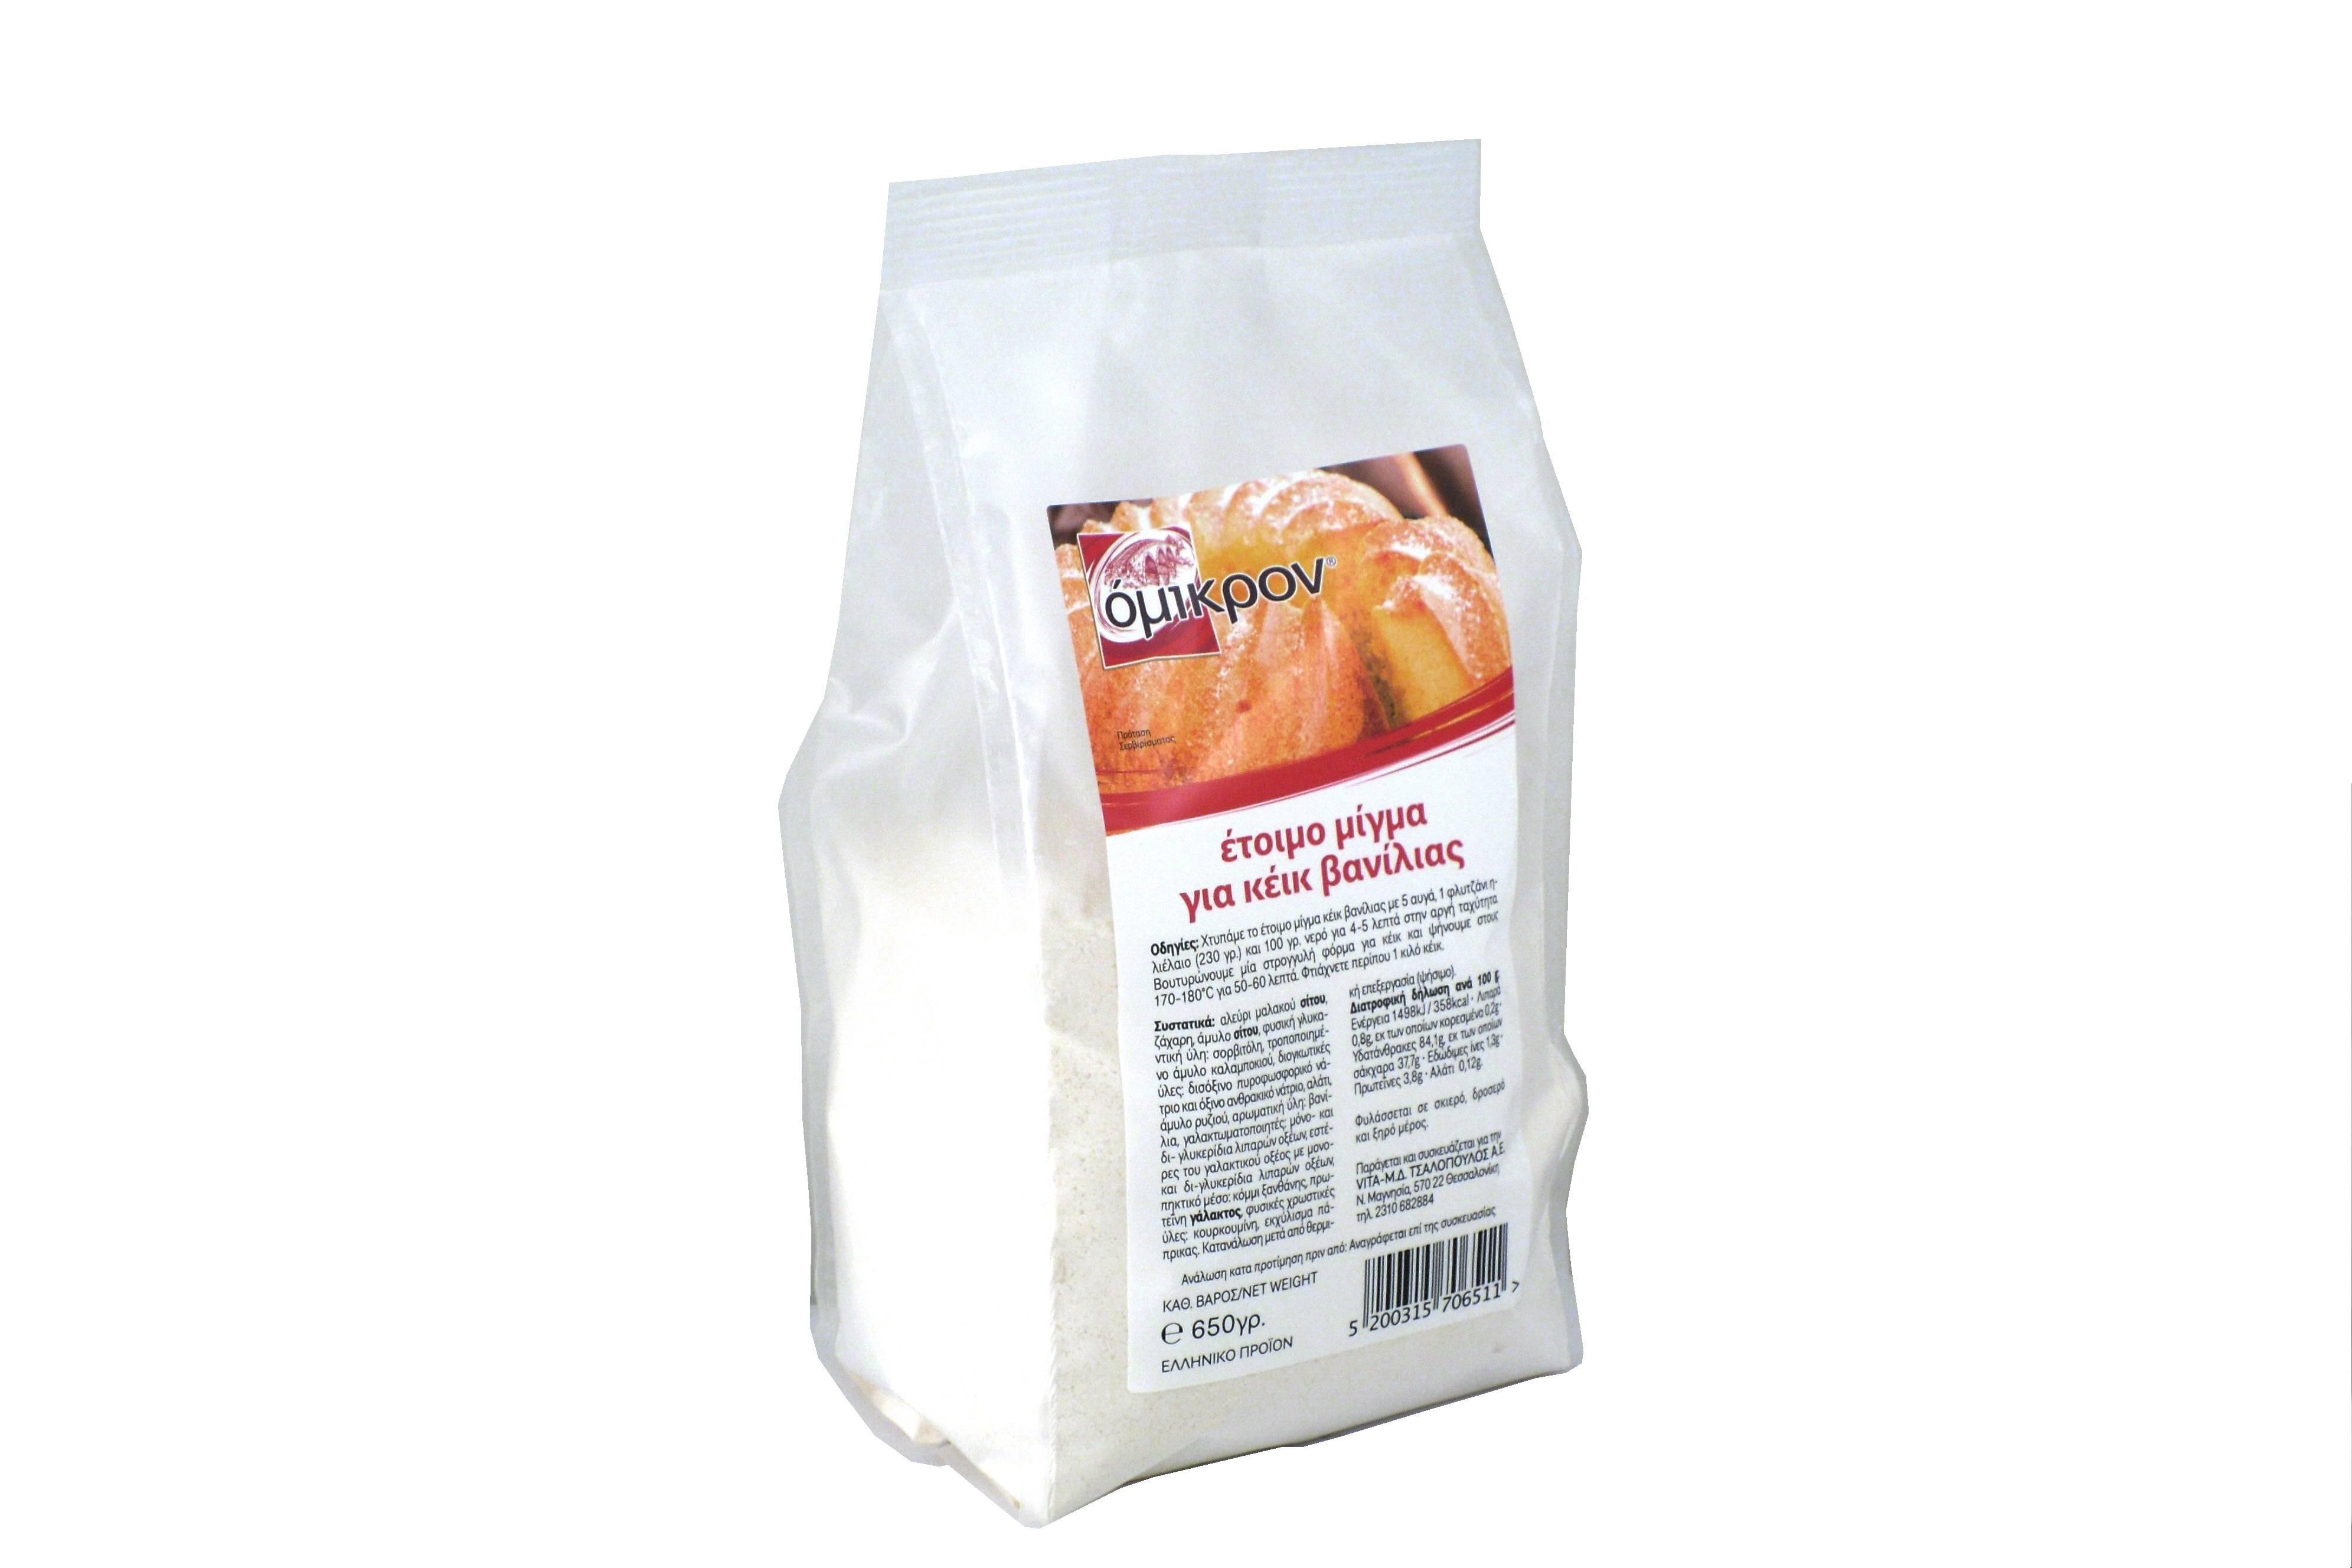 OMIKRON VANILLA CAKE MIX 650g - Code 16006002